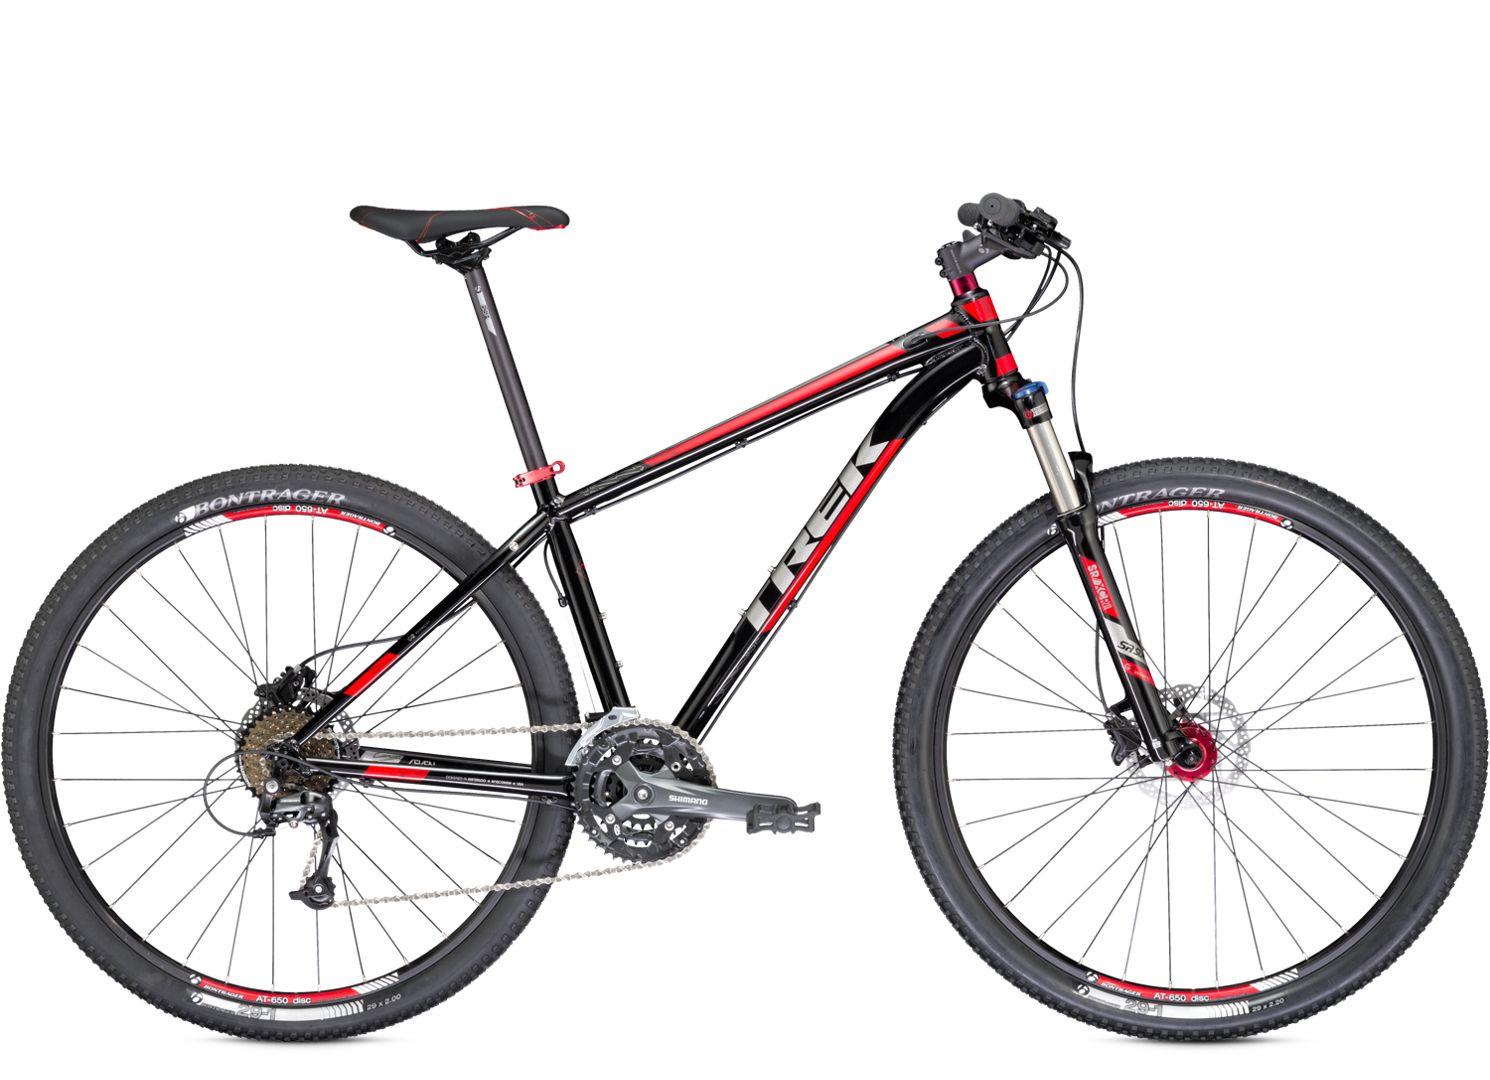 Trek X-Caliber 7 Red/Black 2014 This thing rides so smooth